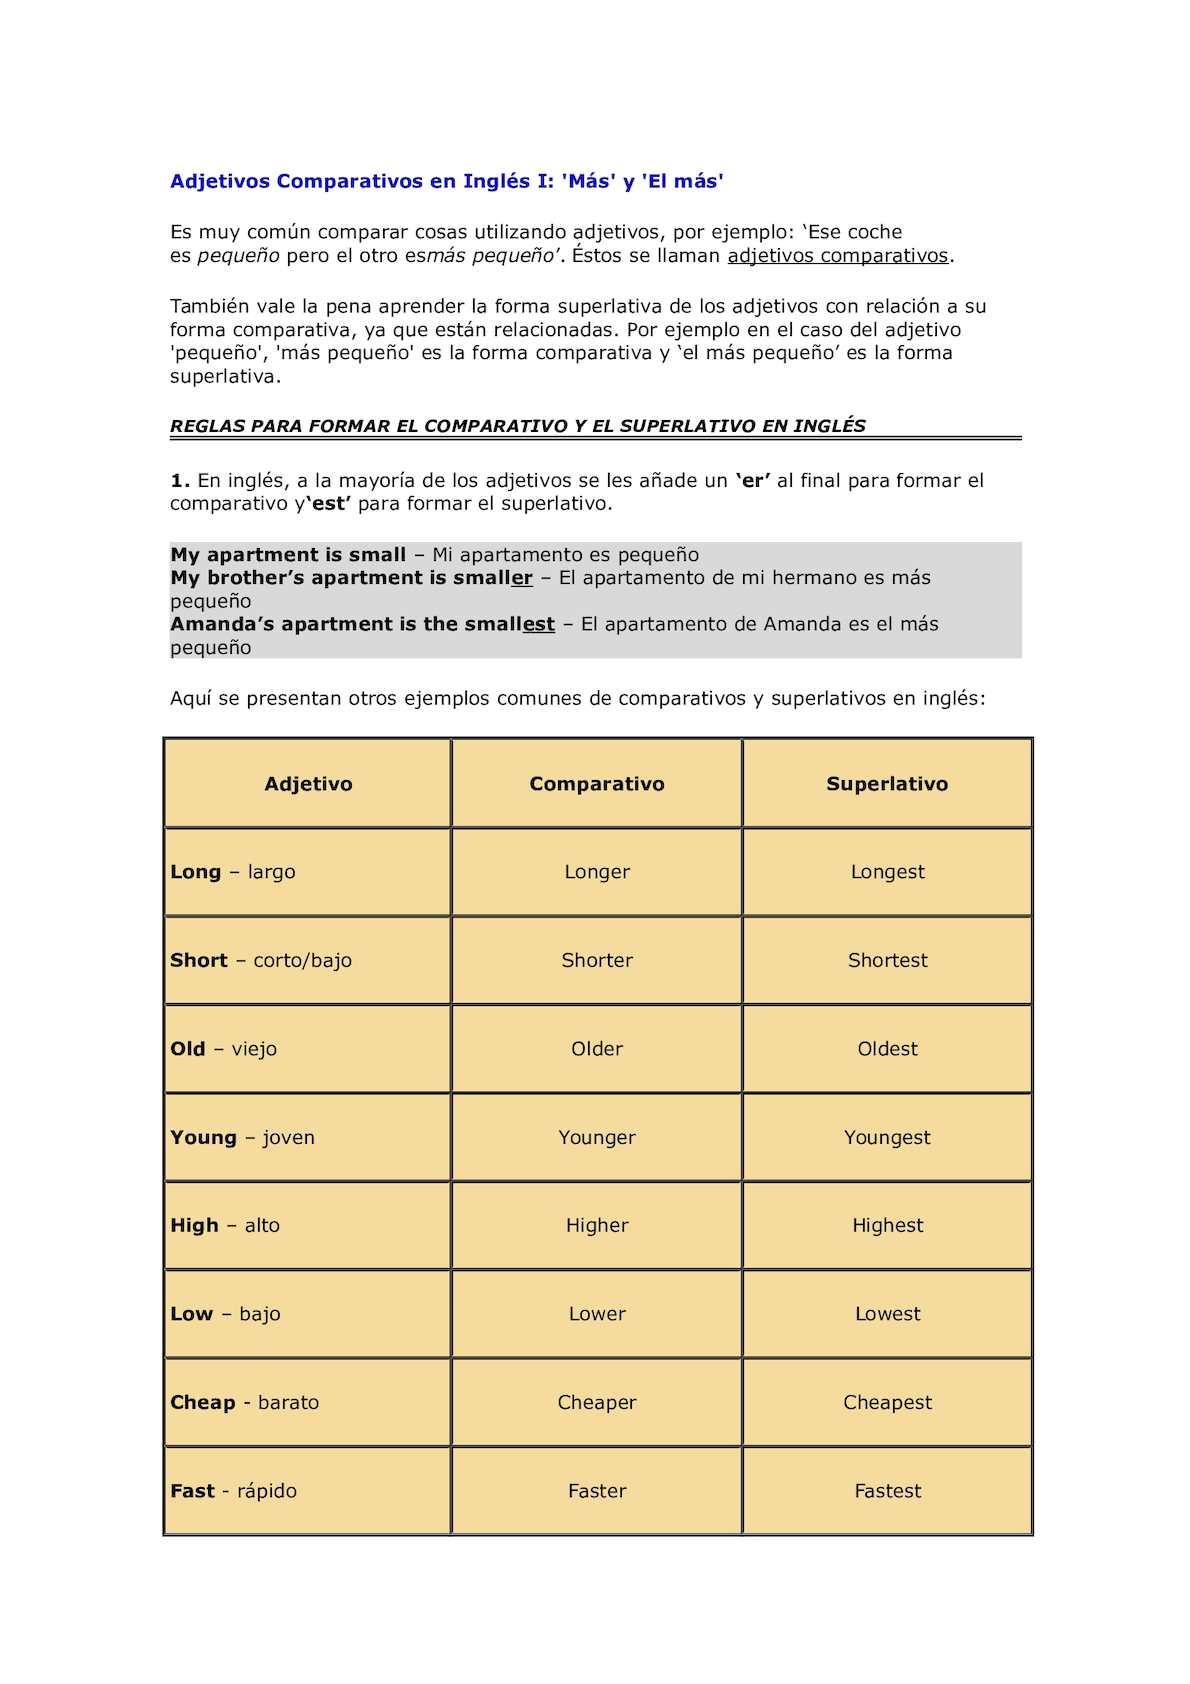 Calaméo Adjetivos Comparativos En Inglés I